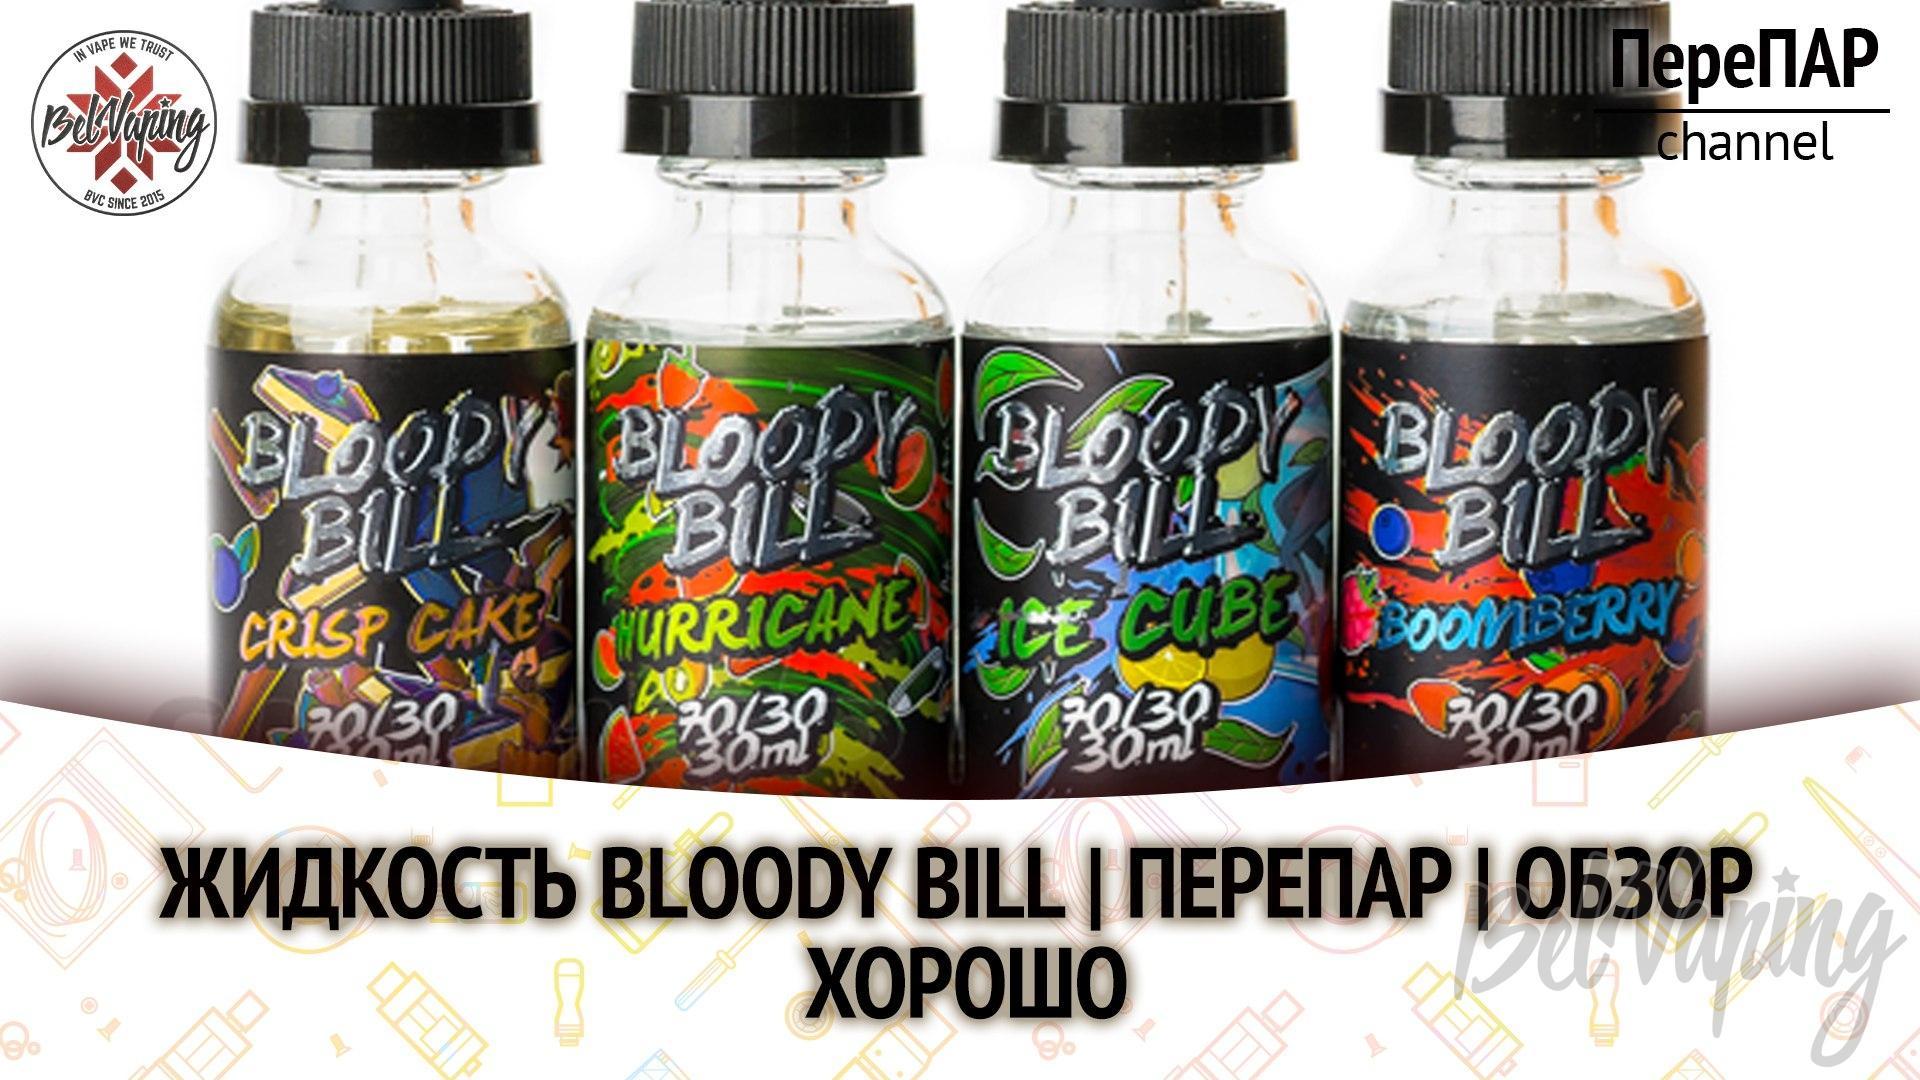 Обзор жидкости Bloody Bill